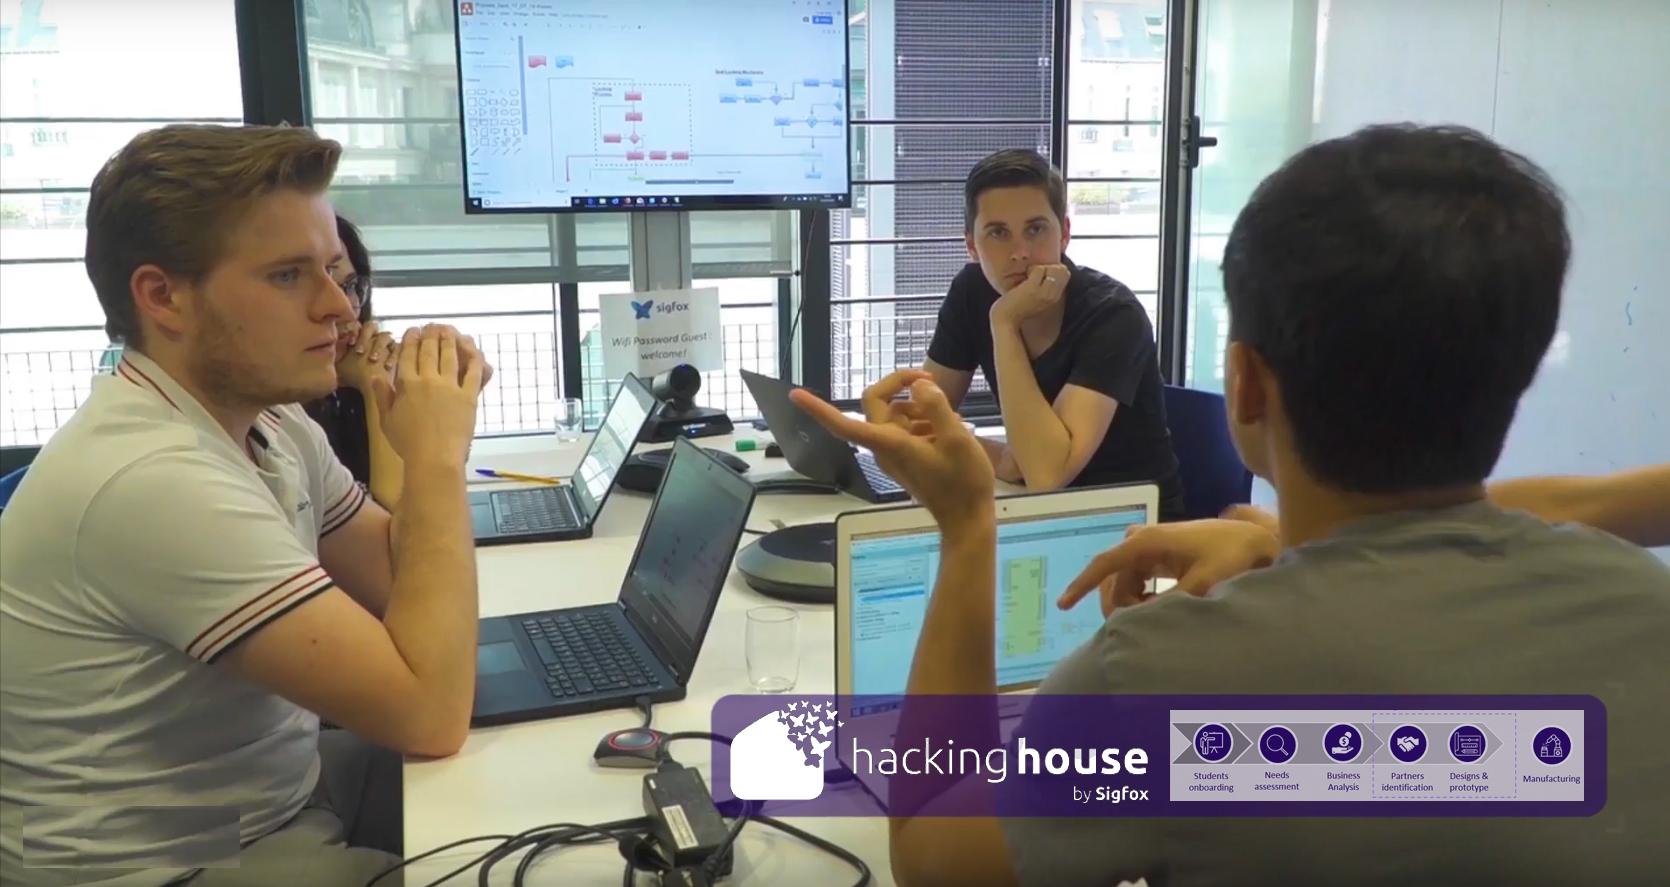 Sigfox Hacking House wird fünf IoT-Startups hervorbringen